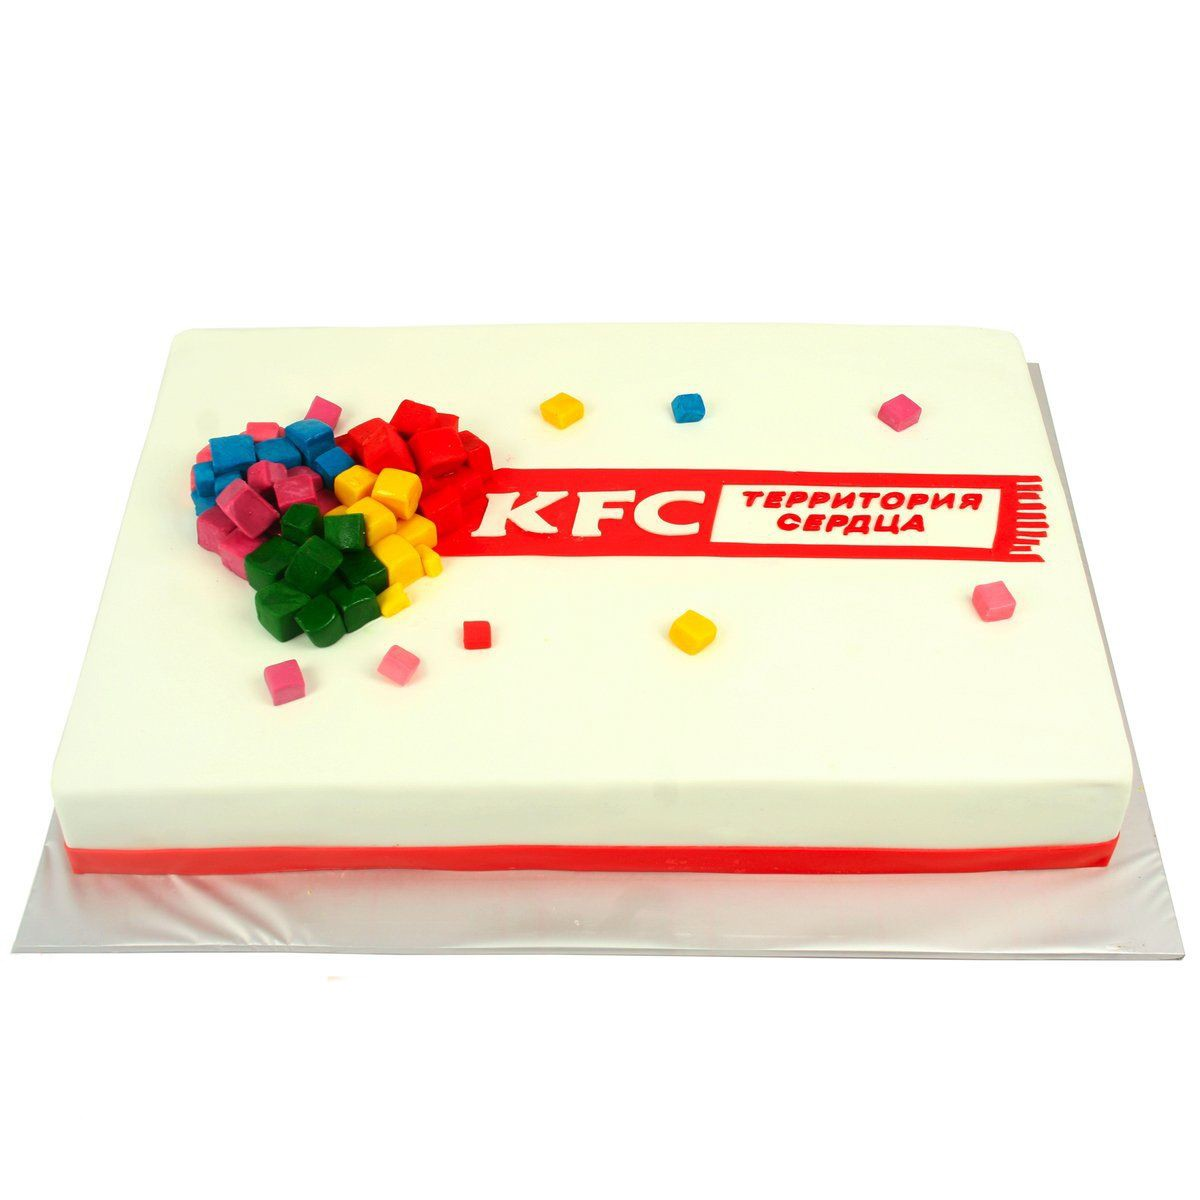 №1439 Торт кфс